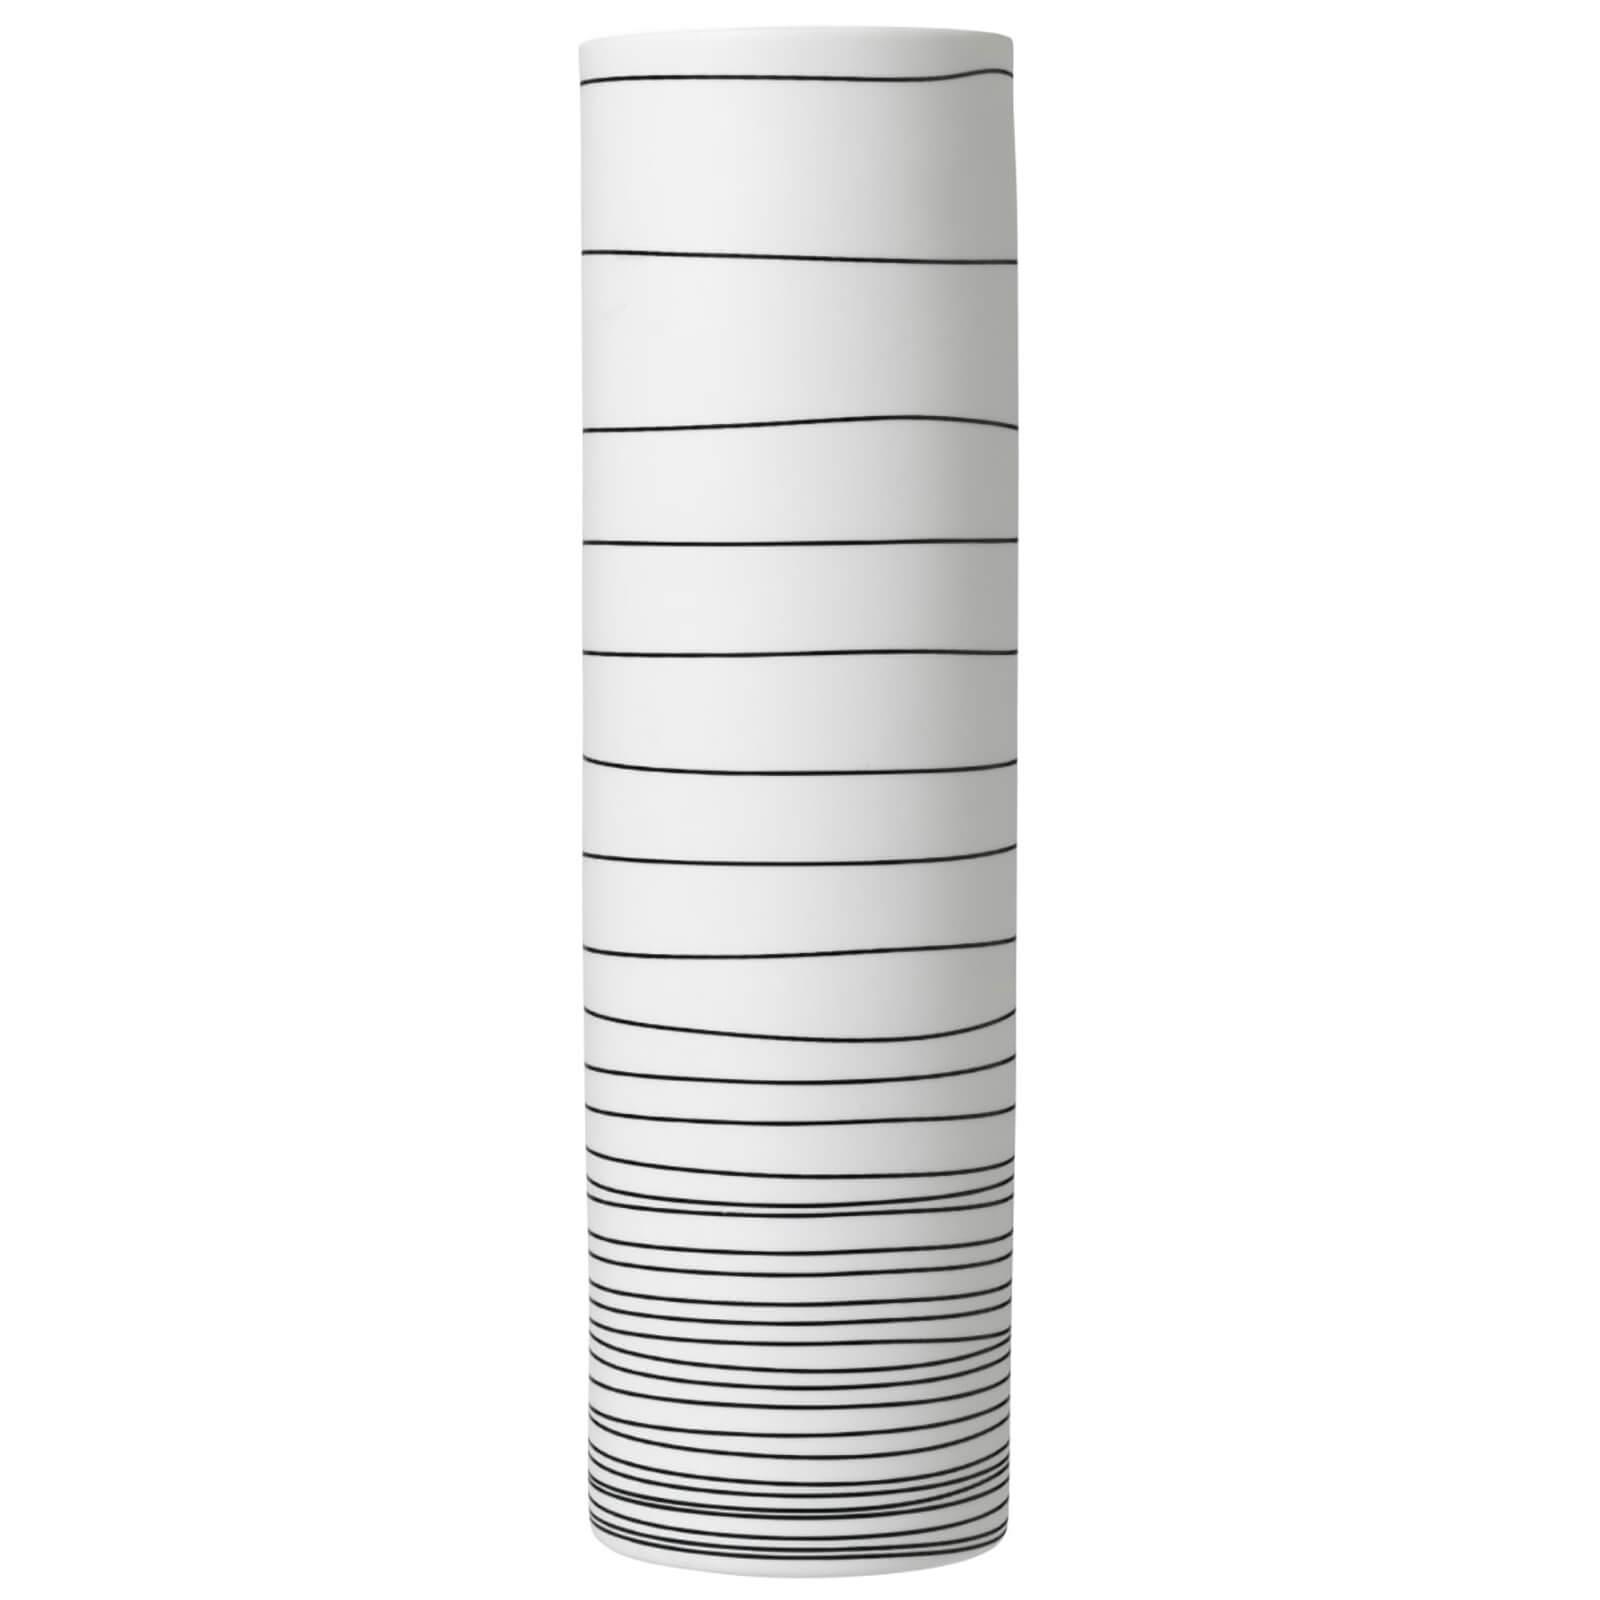 Blomus Zebra Vase - Small